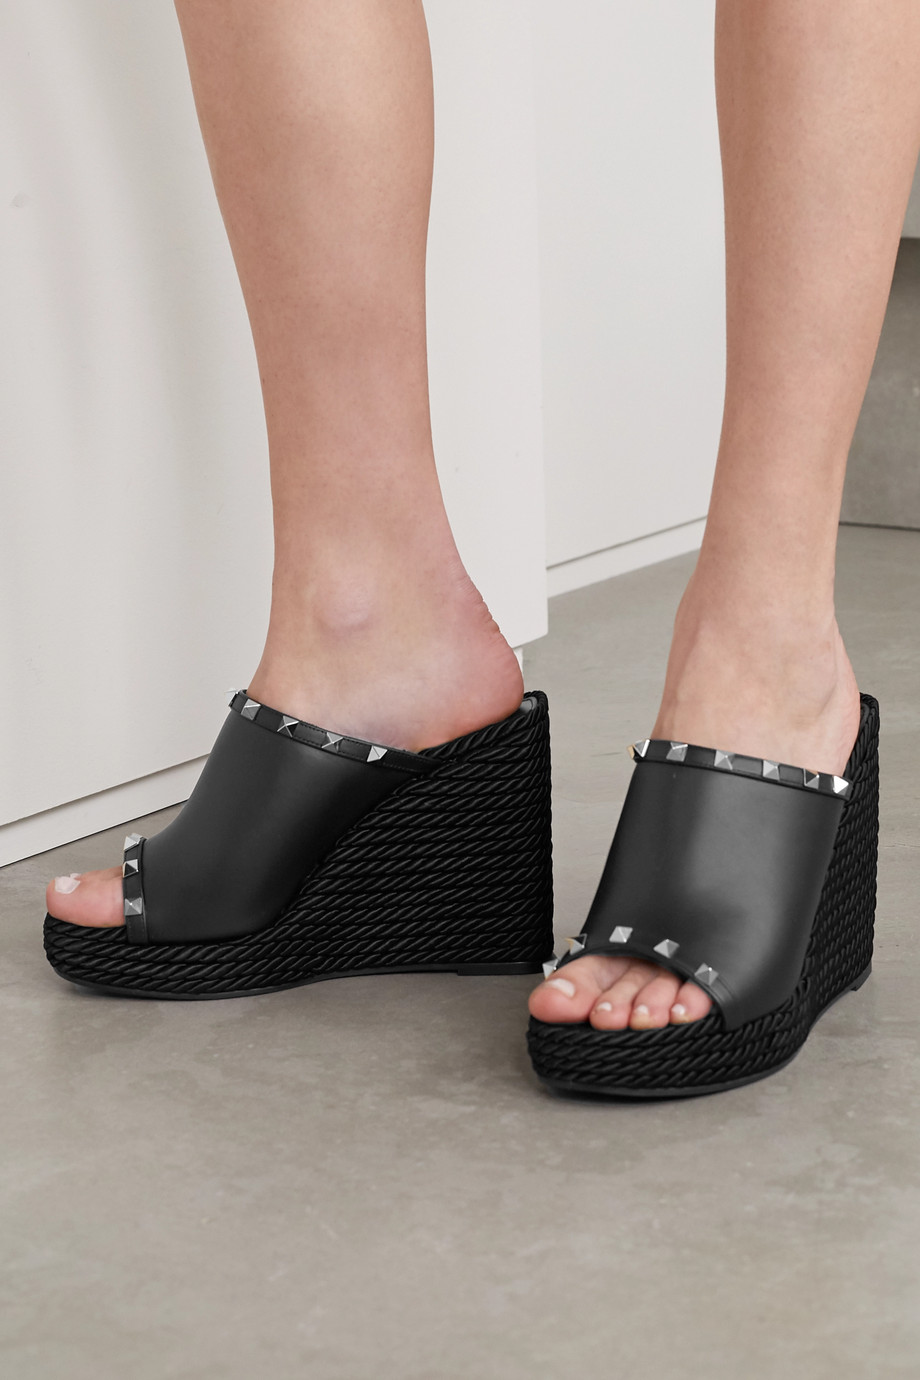 Valentino Valentino Garavani Rockstud 95 leather espadrille wedge sandals